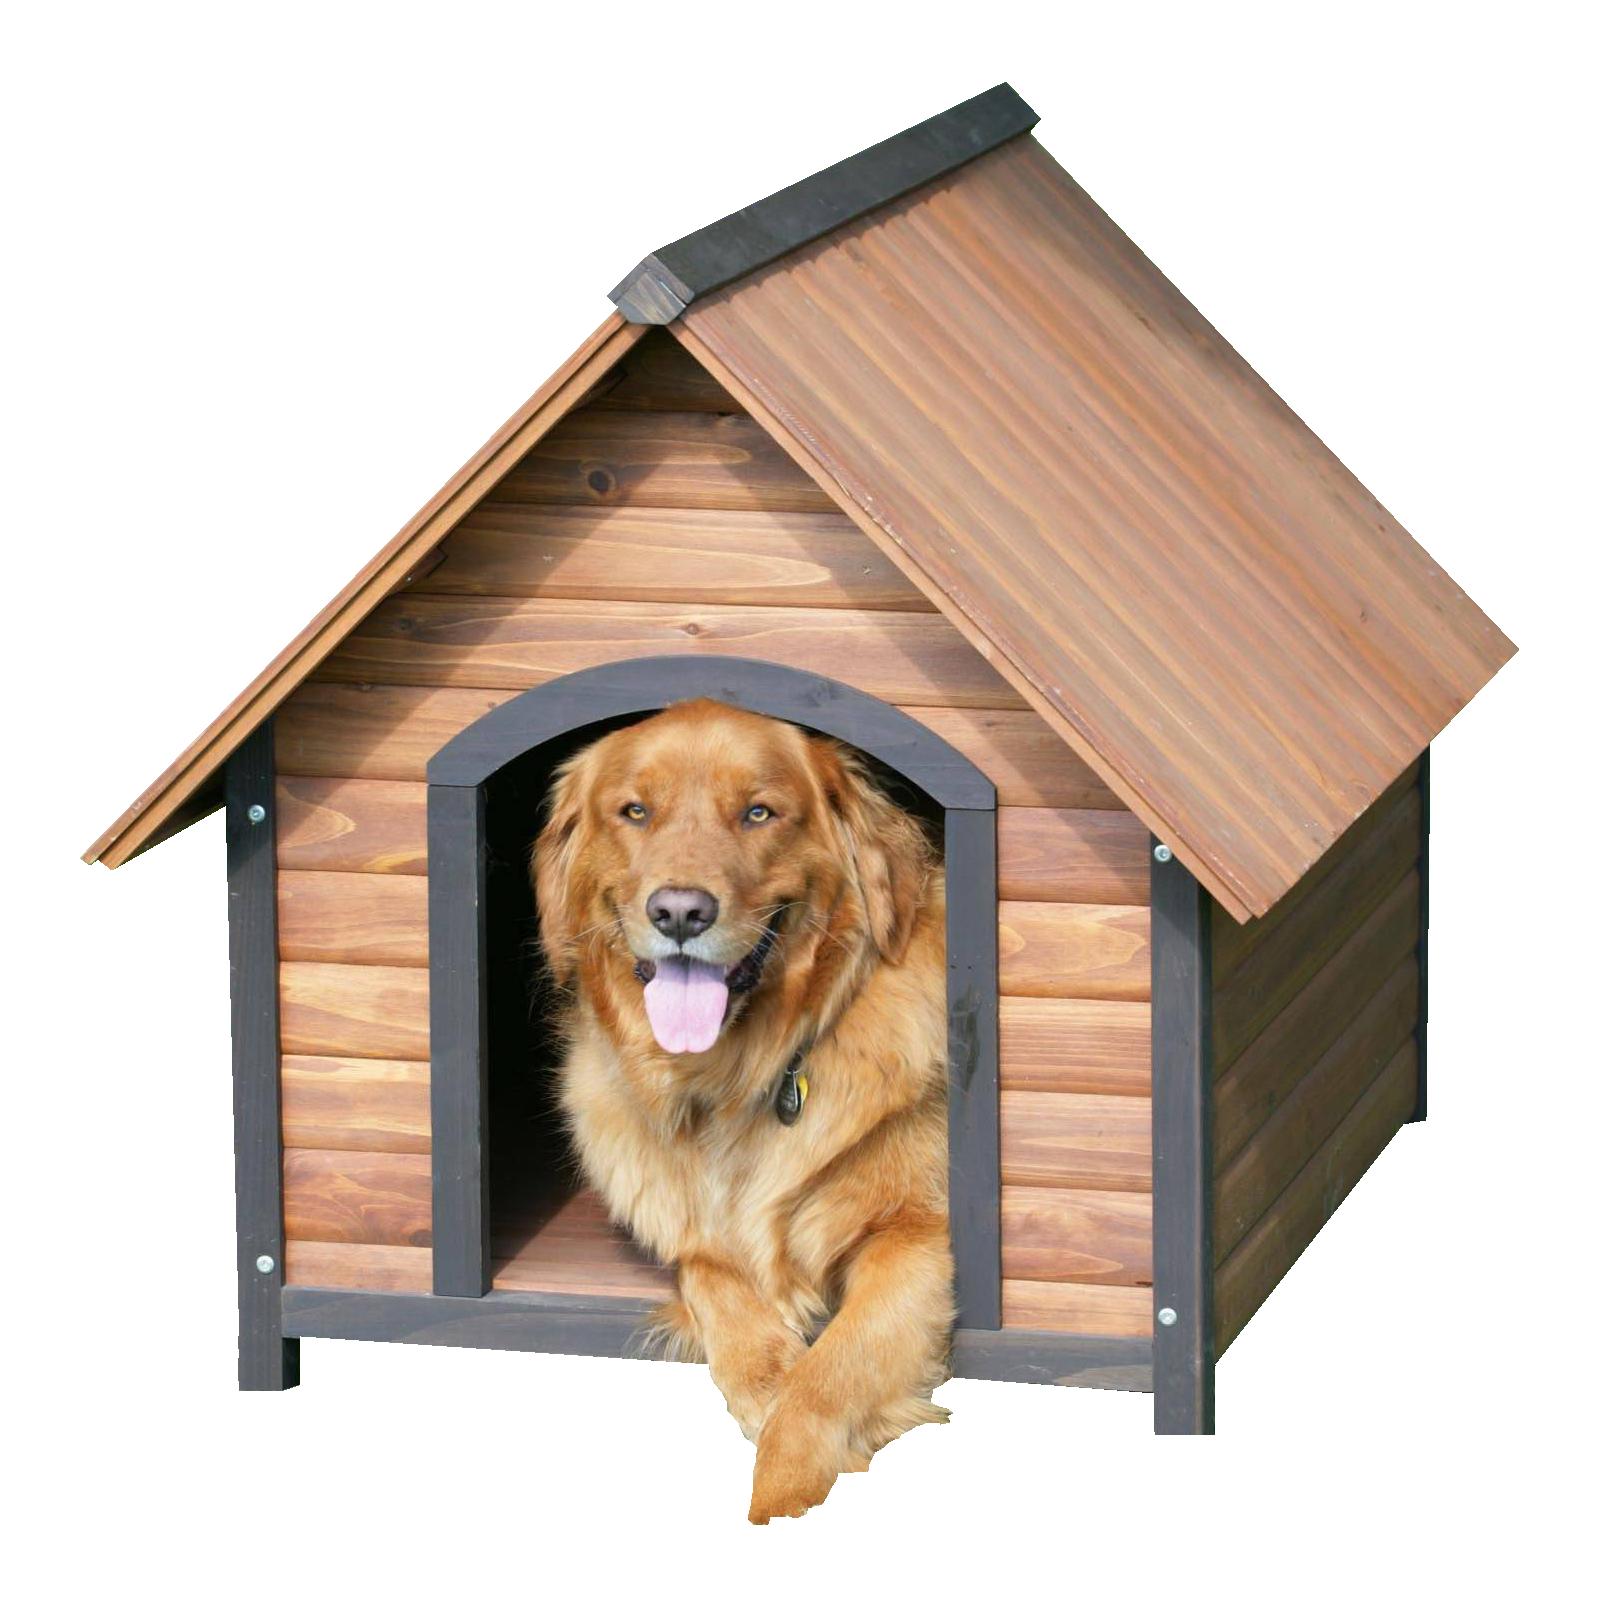 Dog png images pngpix. Doghouse clipart bulldog